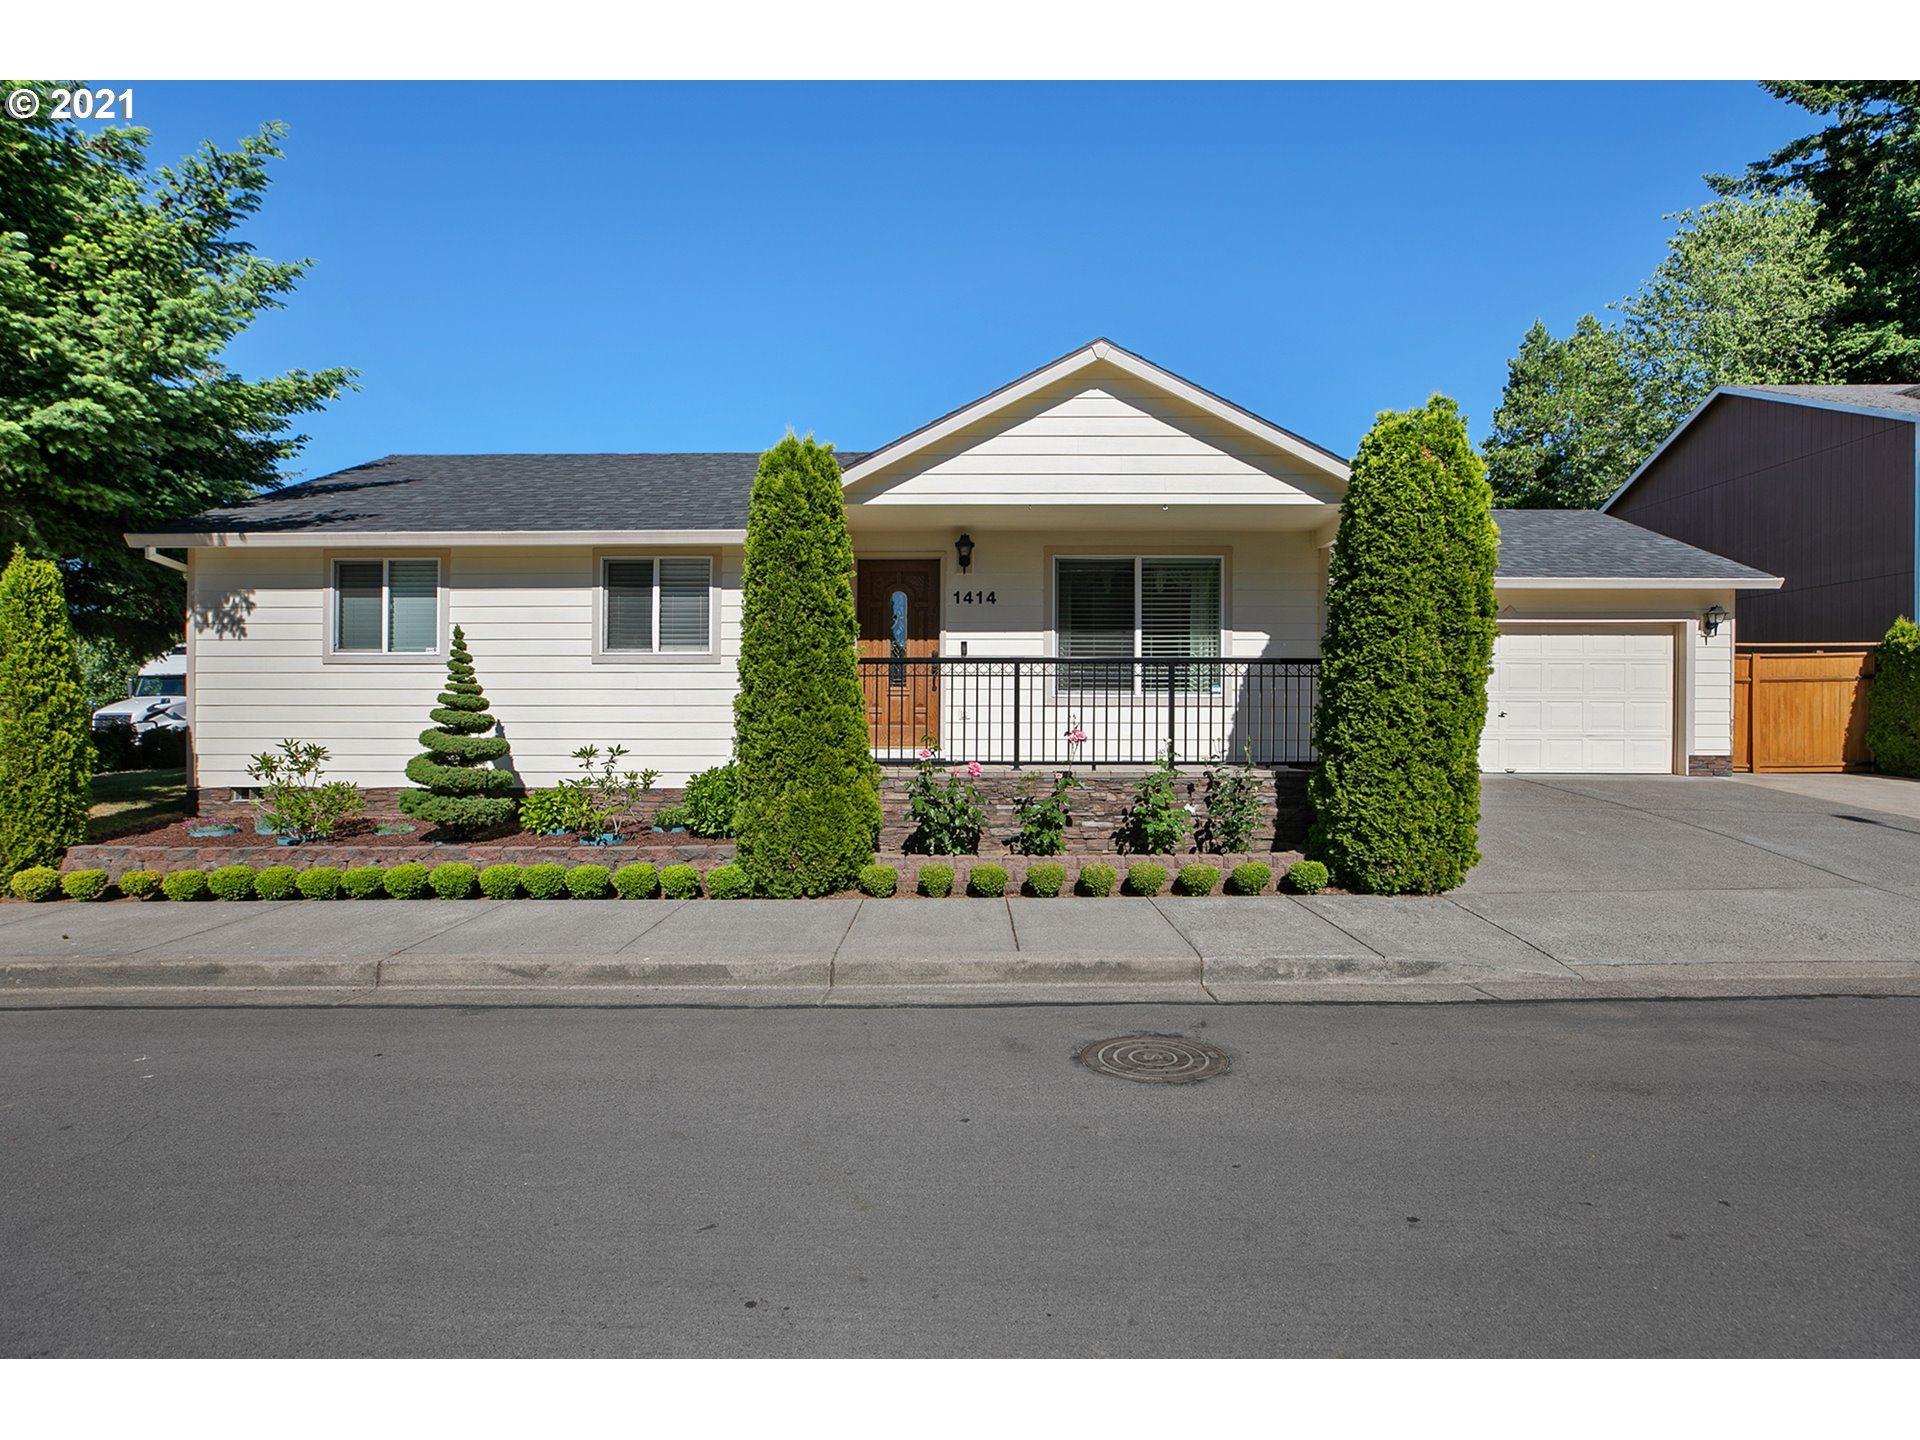 1414 SE 180TH WAY, Portland, OR 97233 - MLS#: 21159147